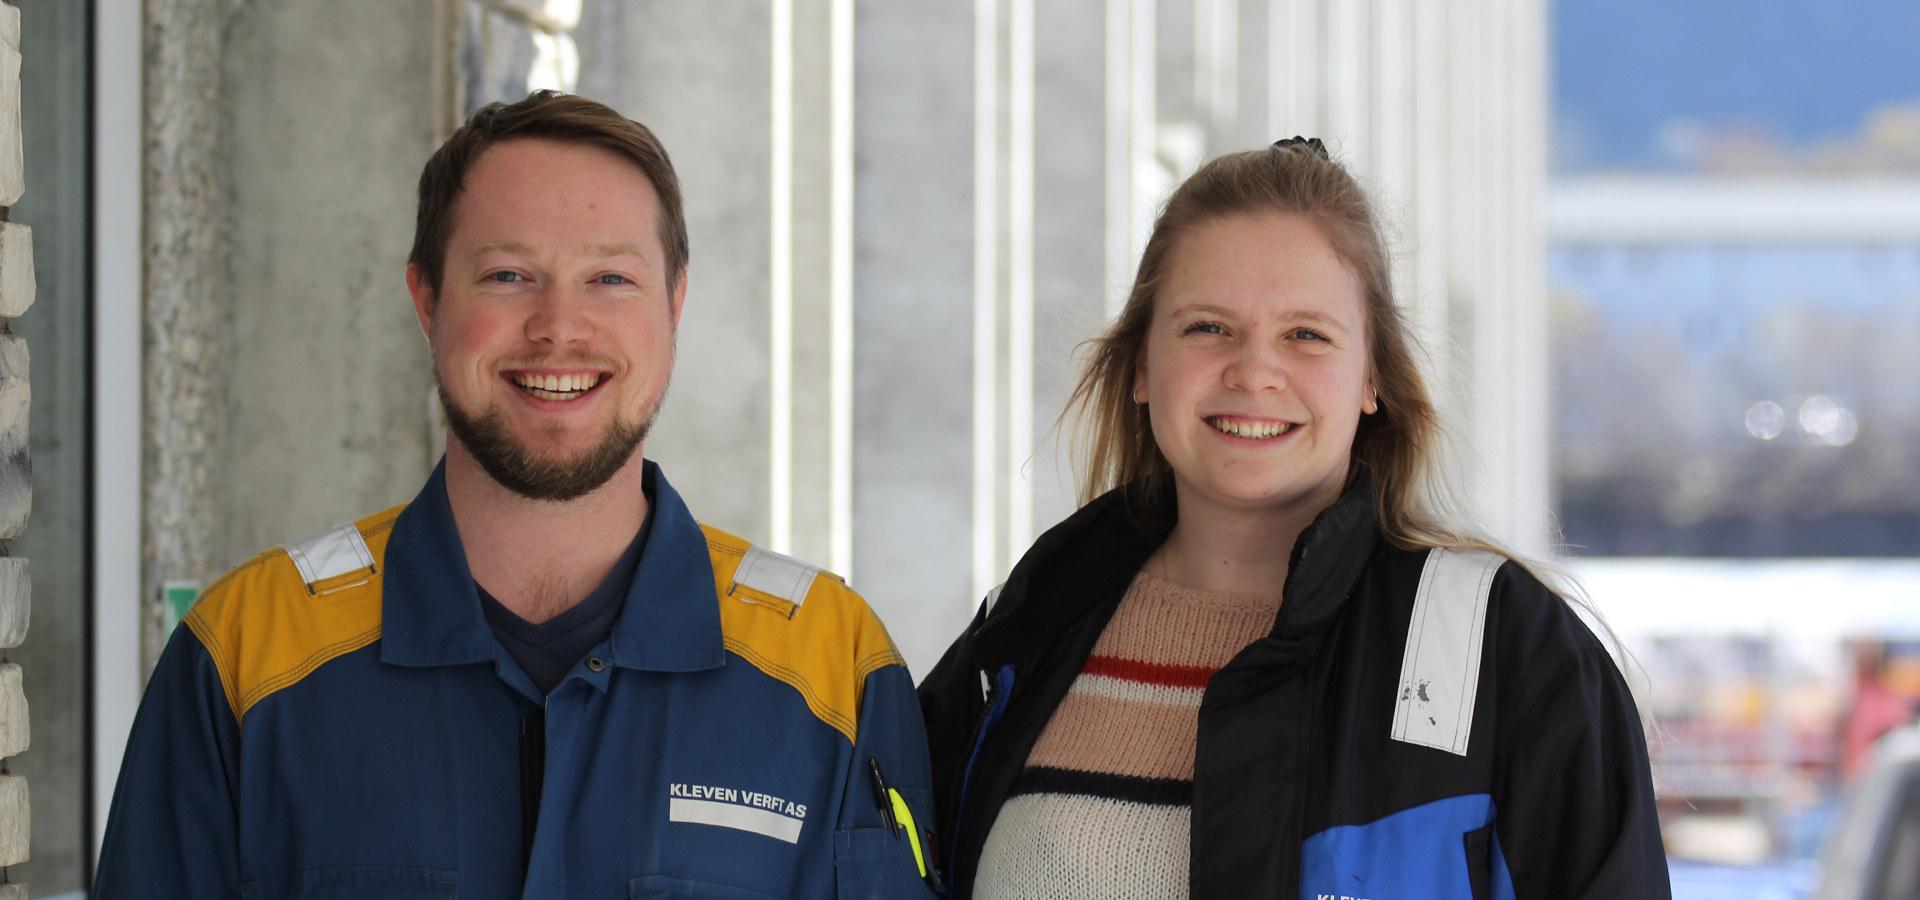 Øyvind Aakre Støylen og Elizabeth McMahon Møller har begge vært TAF-lærlinger hos Kleven gjennom Ulstein vidaregåande skule, og jobber nå som ingeniører hos Kleven. Foto: Kleven